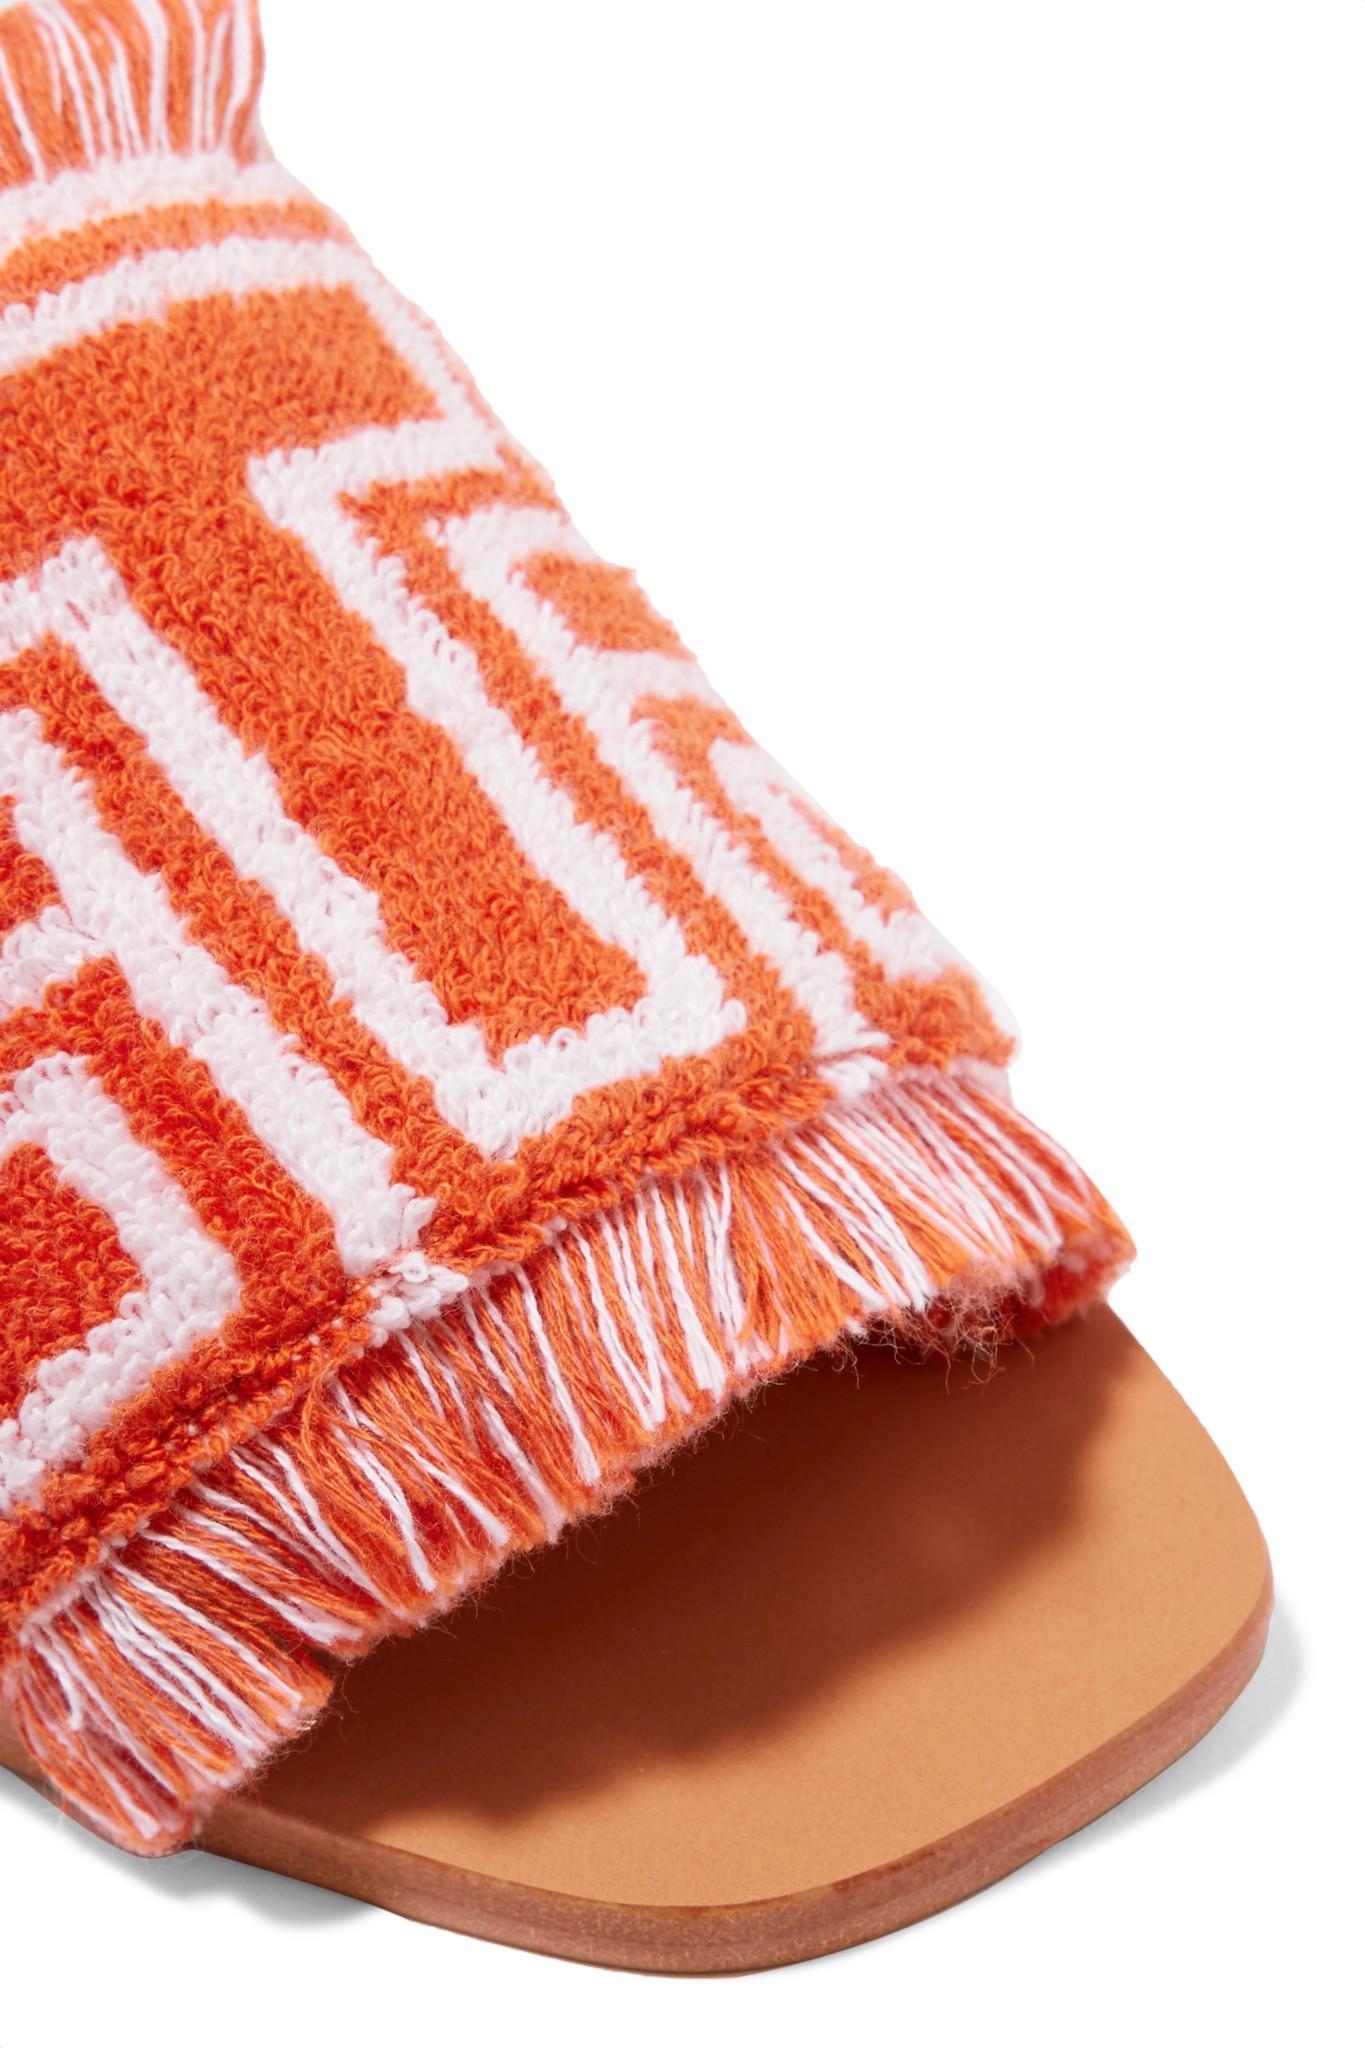 77a1cf3f185e Tory Burch Logo-intarsia Terry Slides in Orange - Lyst